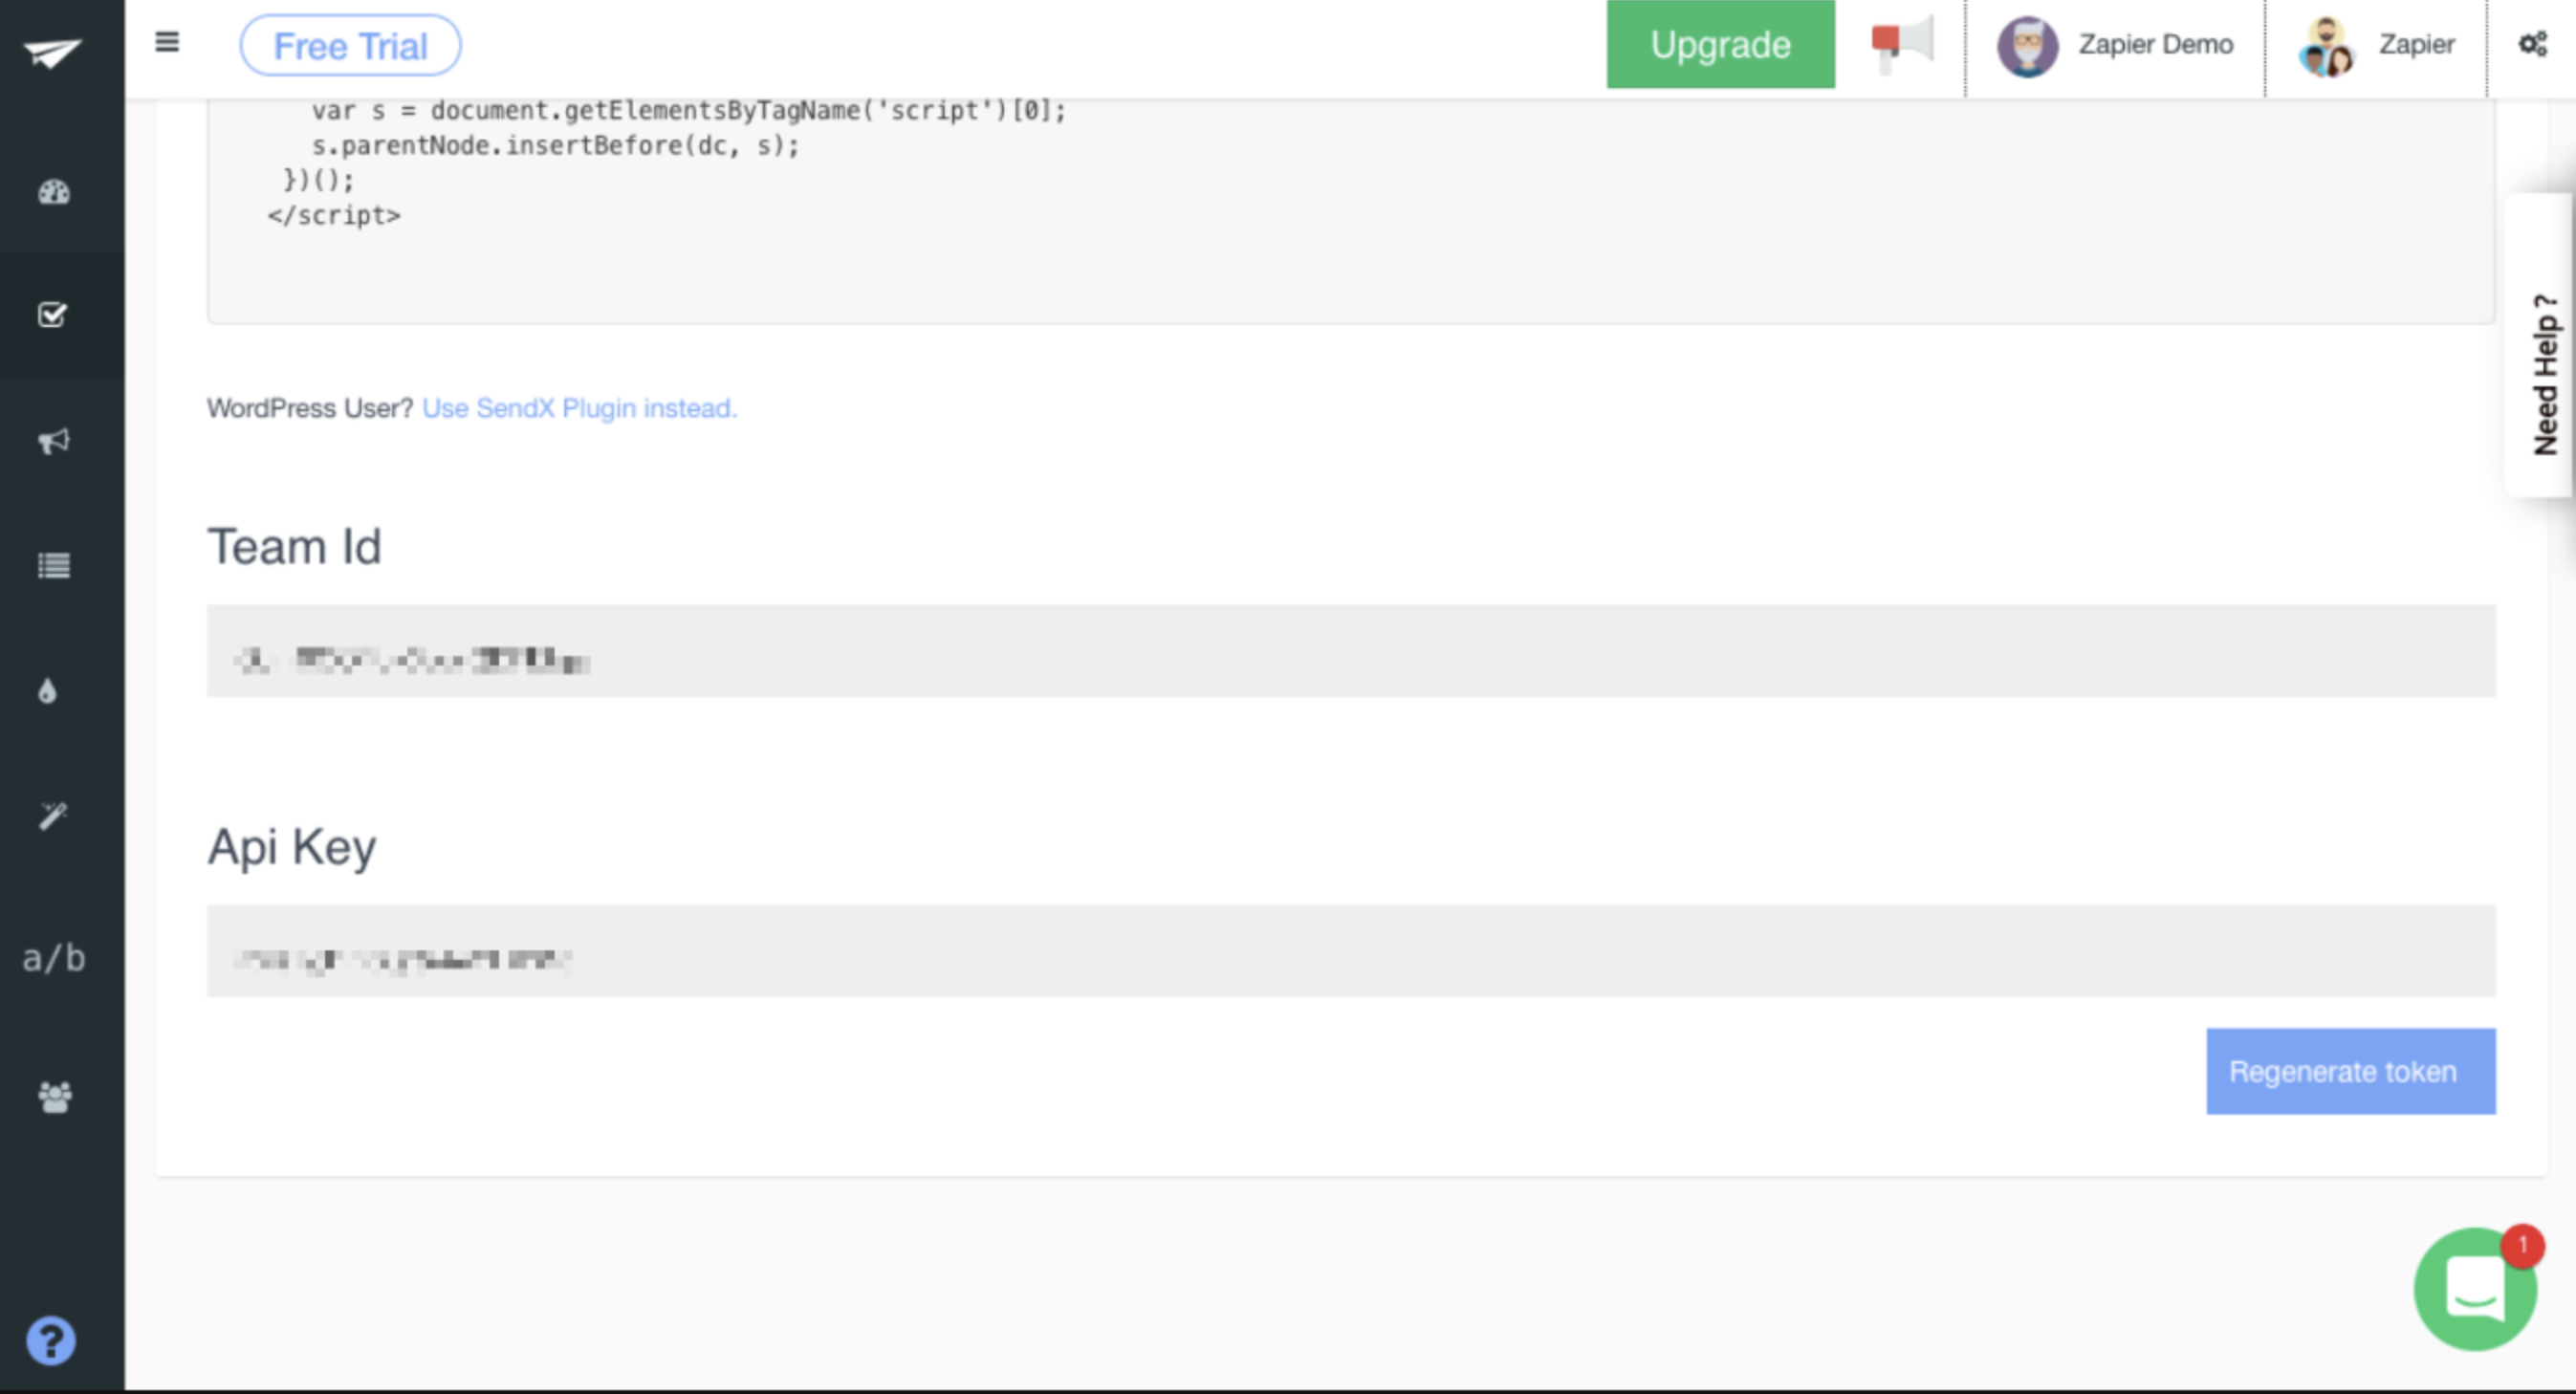 SendX API Key in account